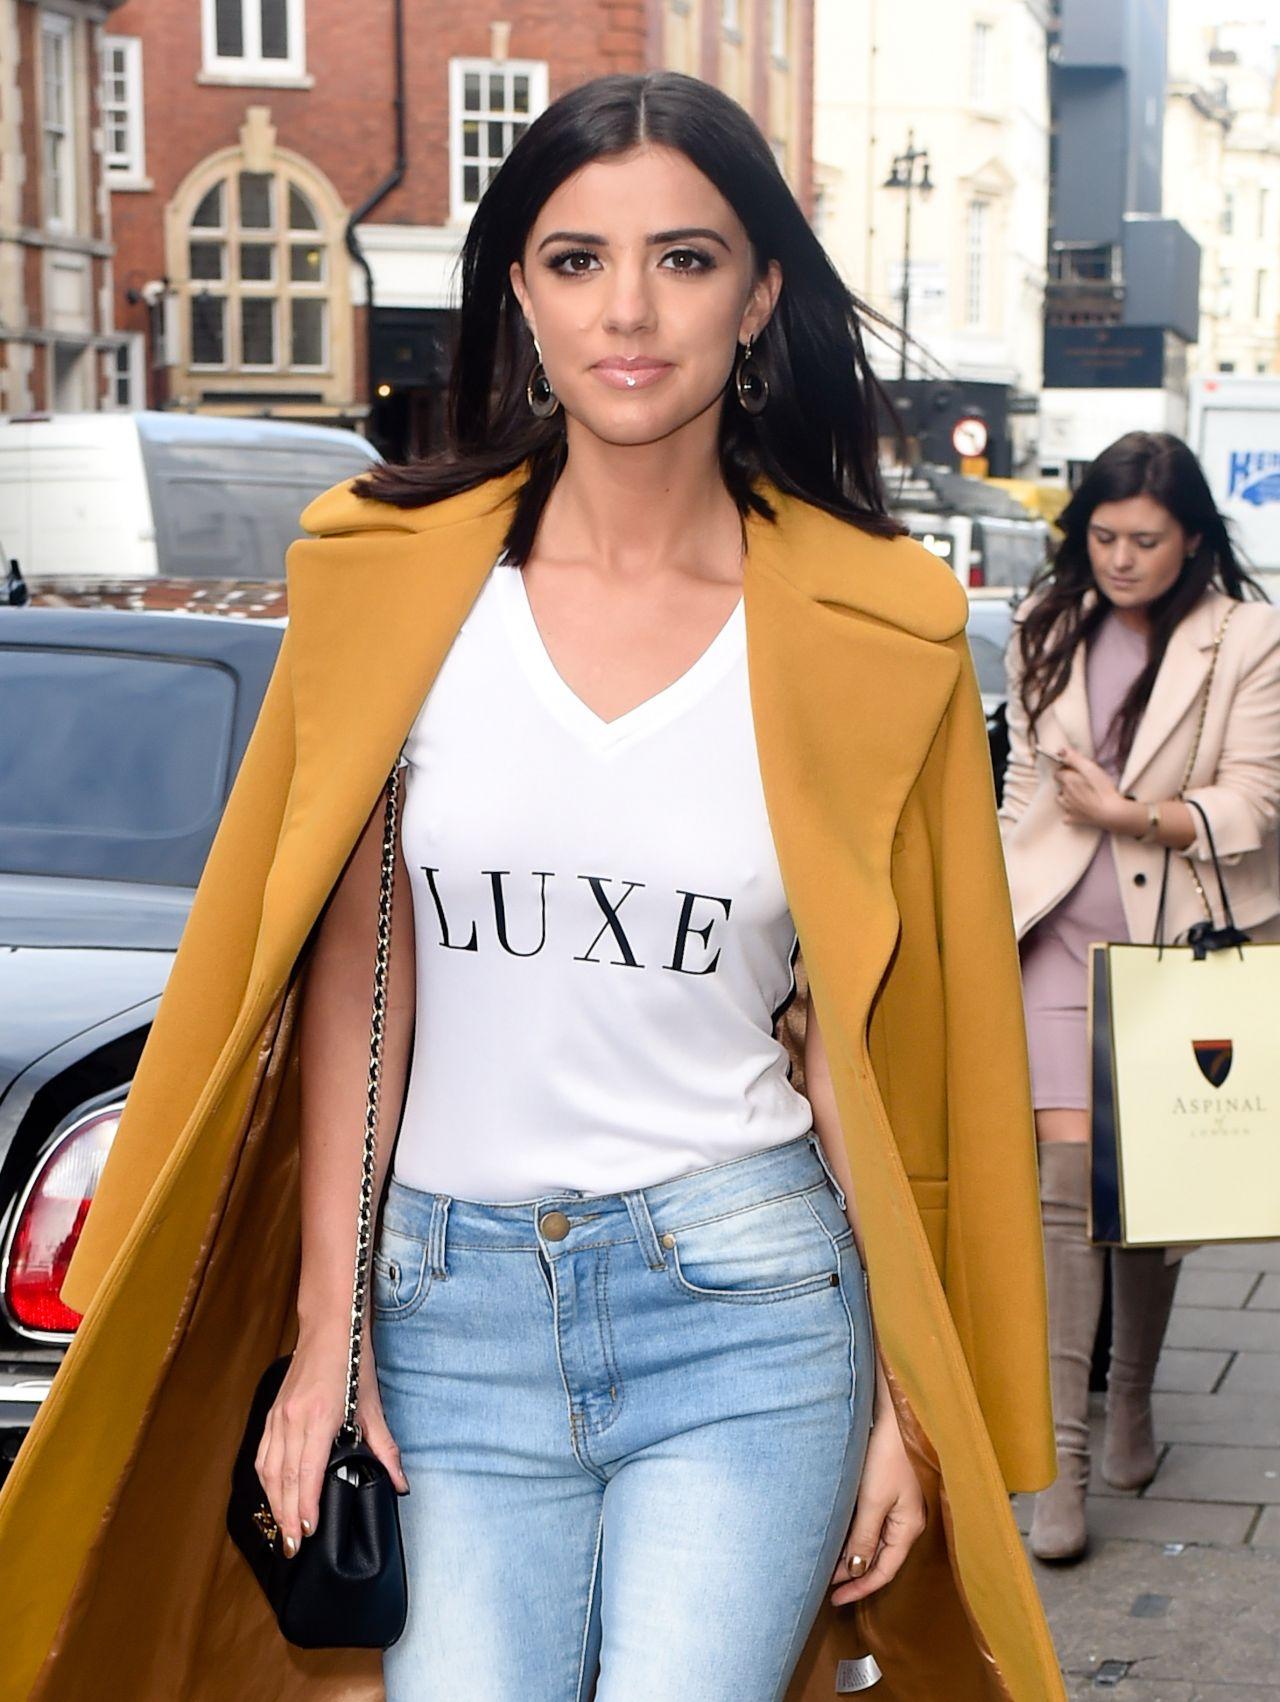 roger of london in Fashion | eBay